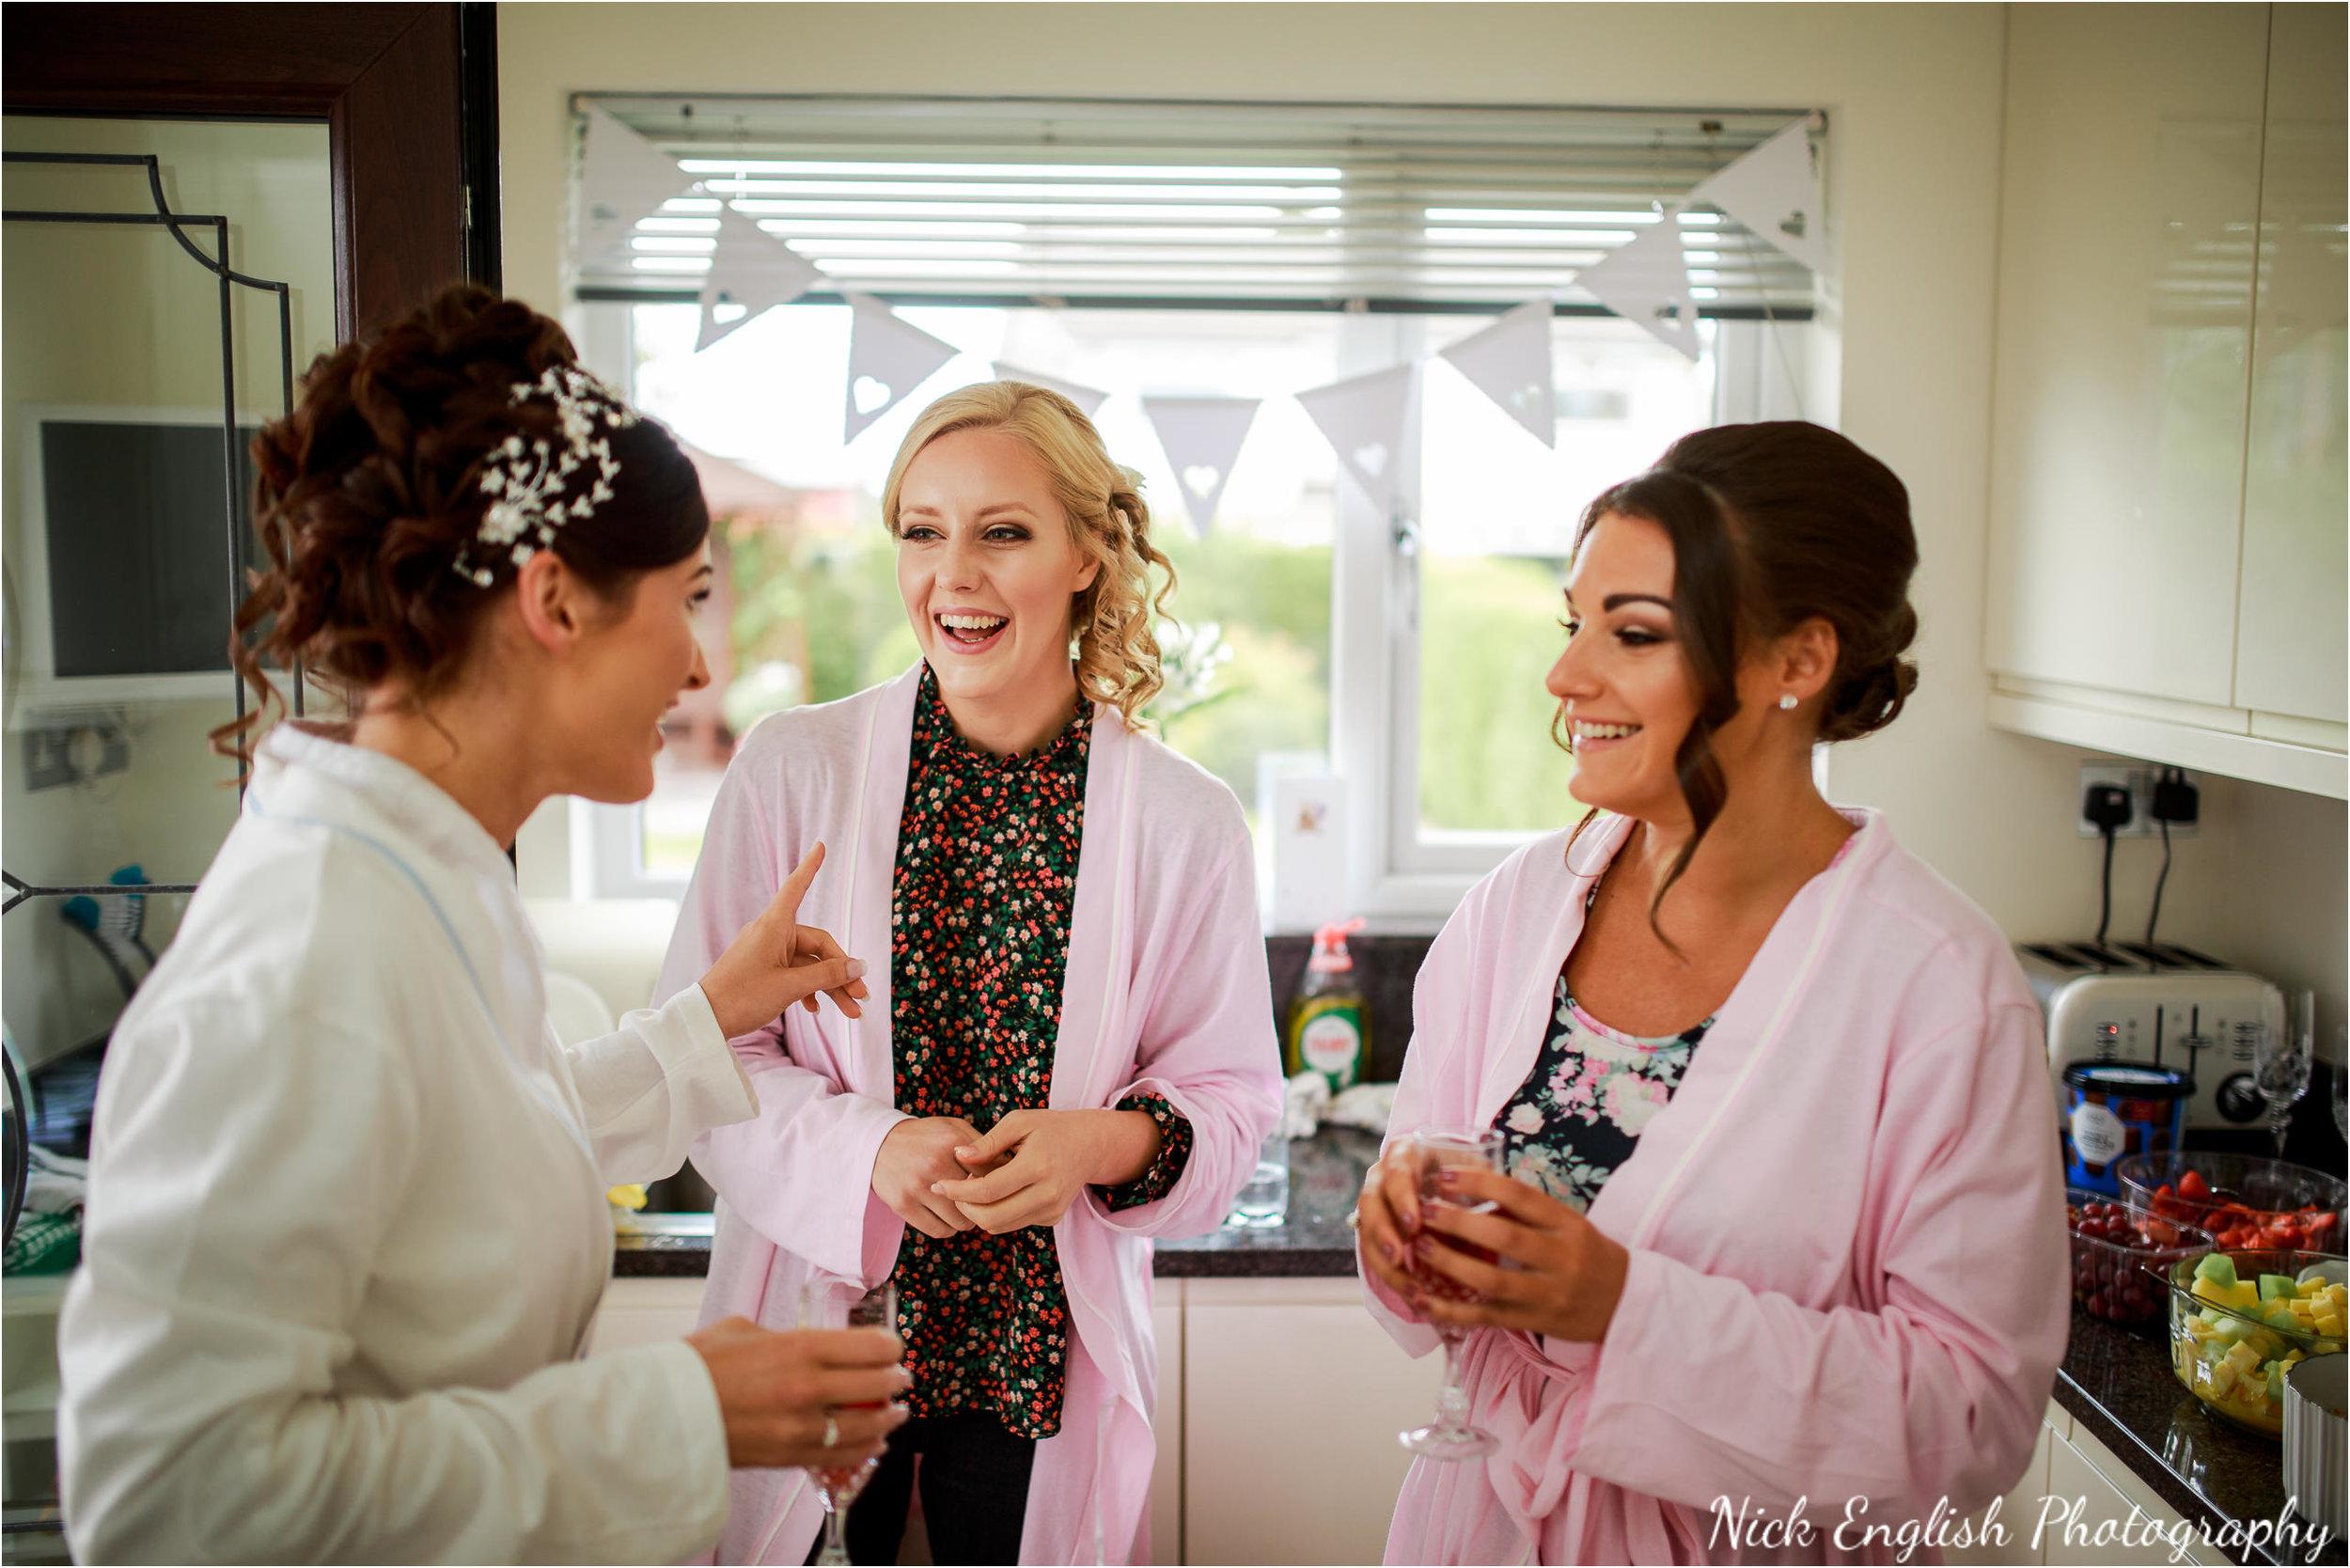 Emily David Wedding Photographs at Barton Grange Preston by Nick English Photography 26jpg.jpeg